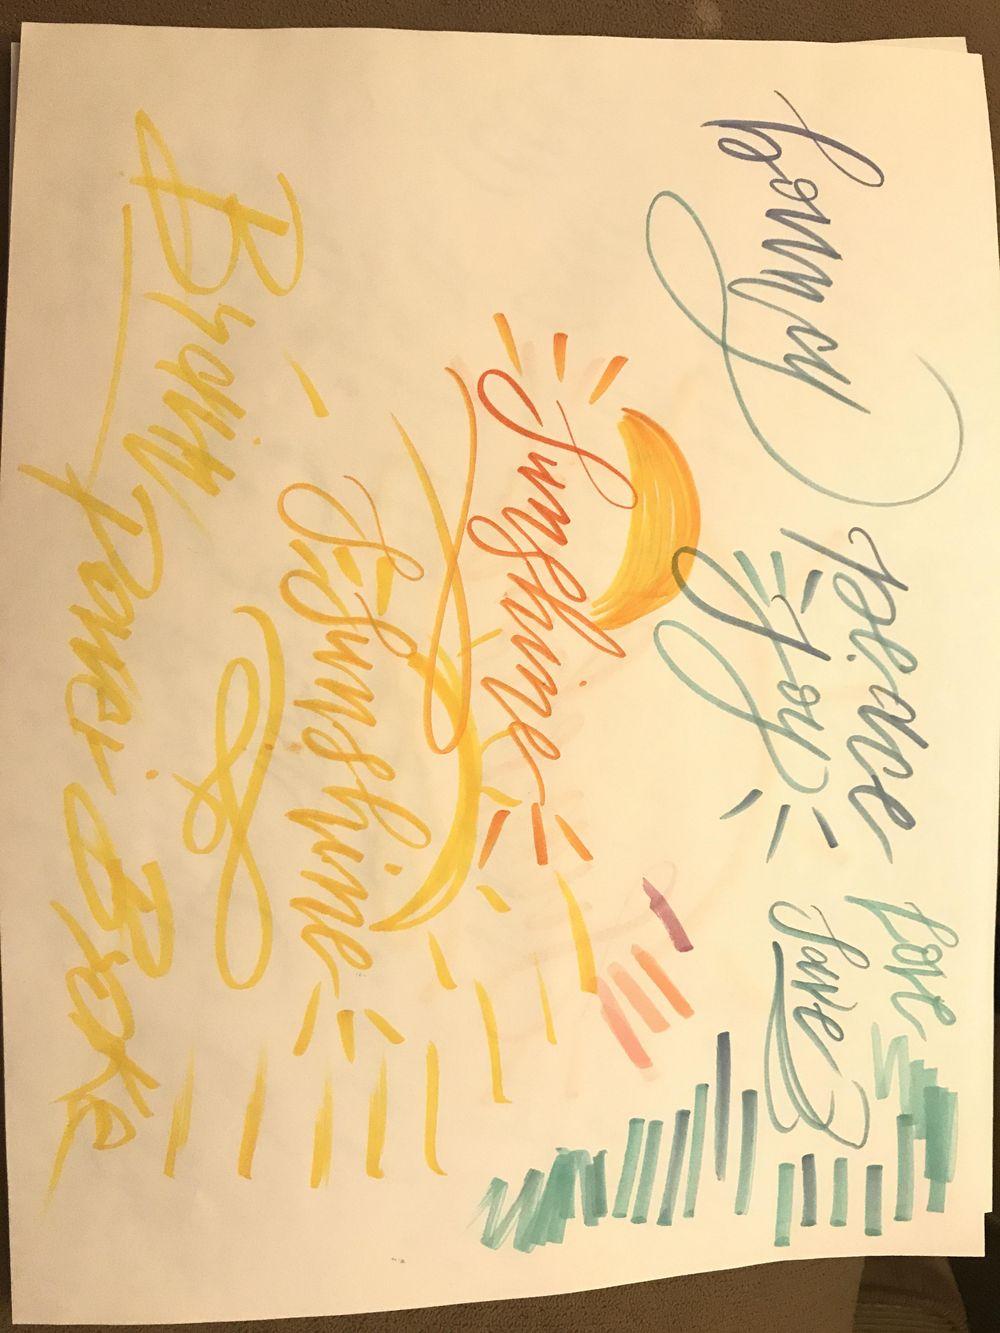 Sunshine - image 1 - student project